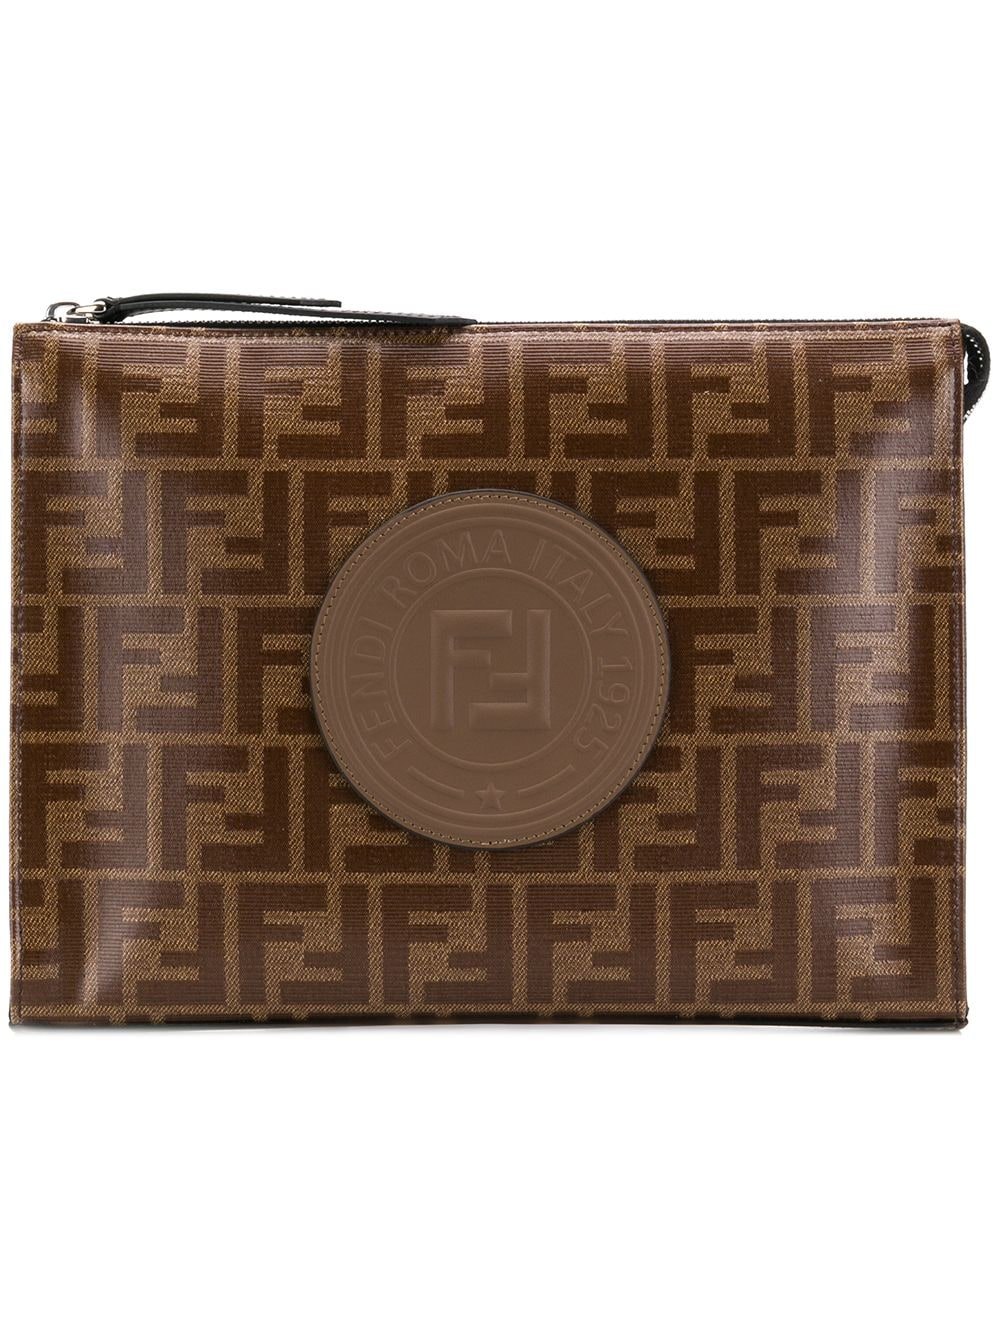 08a65d300923 FENDI FENDI LOGO MONOGRAM CLUTCH BAG.  fendi  bags  leather  clutch  cotton   hand bags